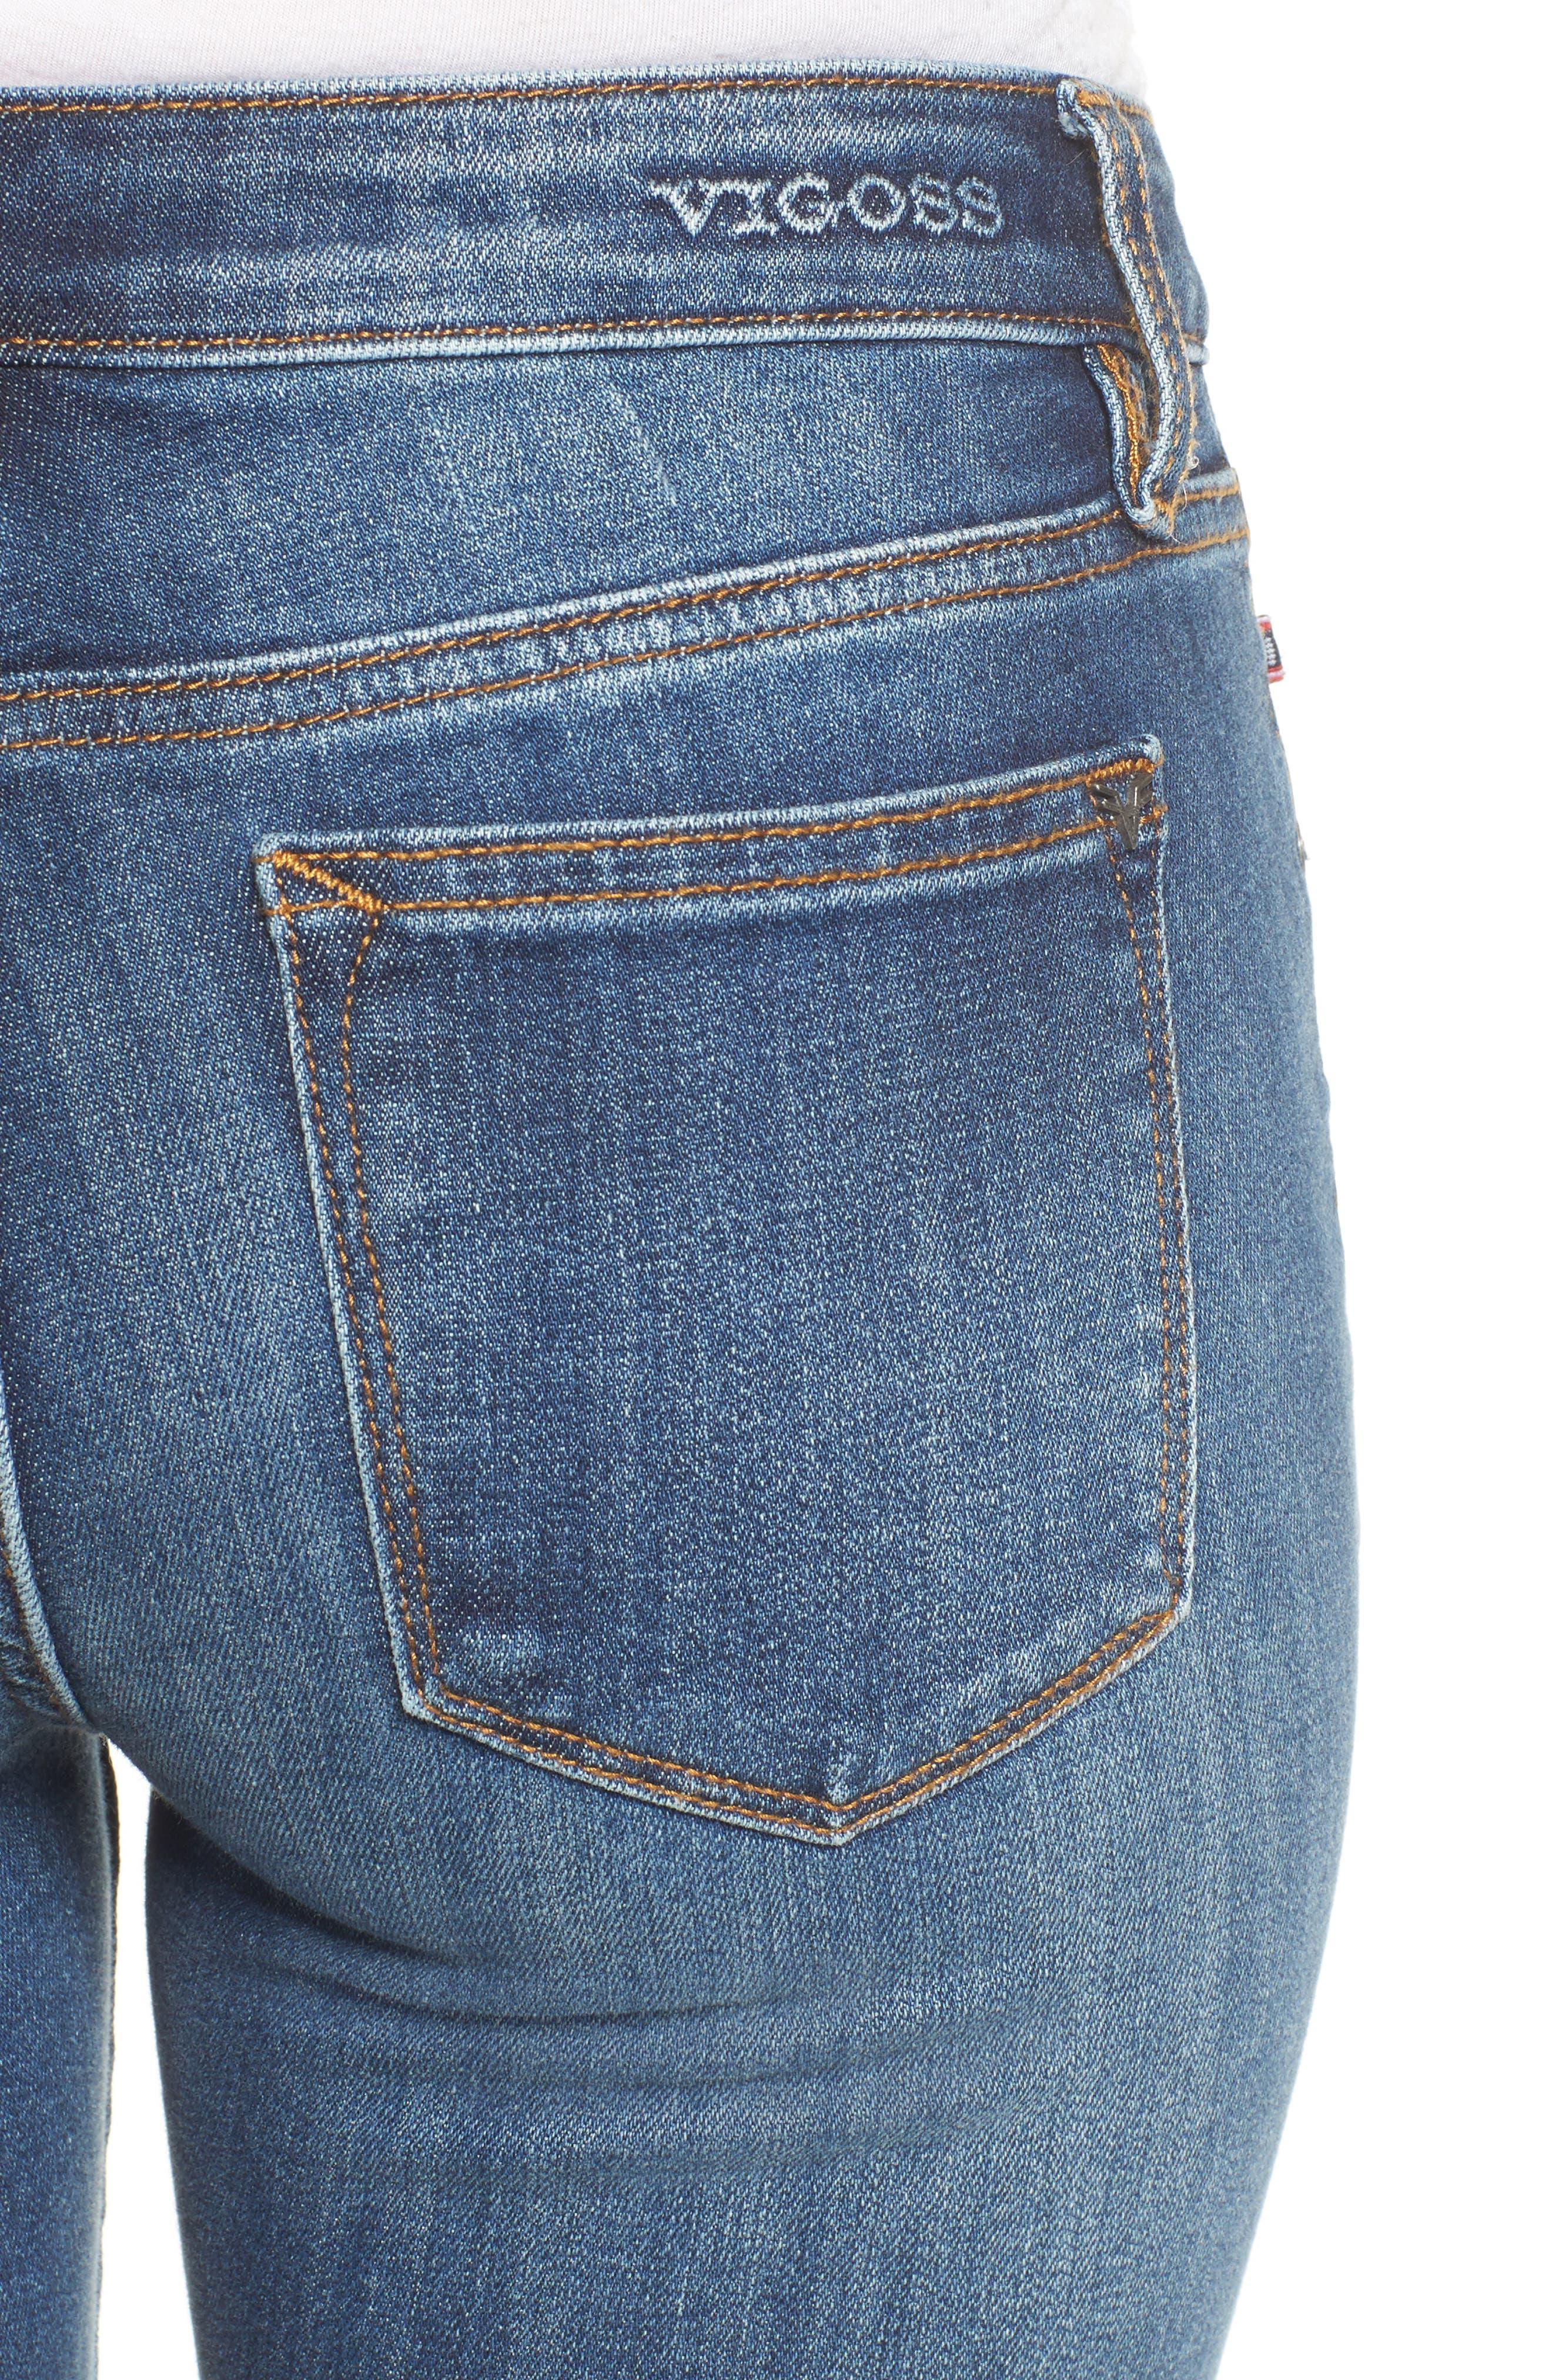 Alternate Image 4  - Vigoss Jagger Mid-Rise Skinny Jeans (Medium Wash)